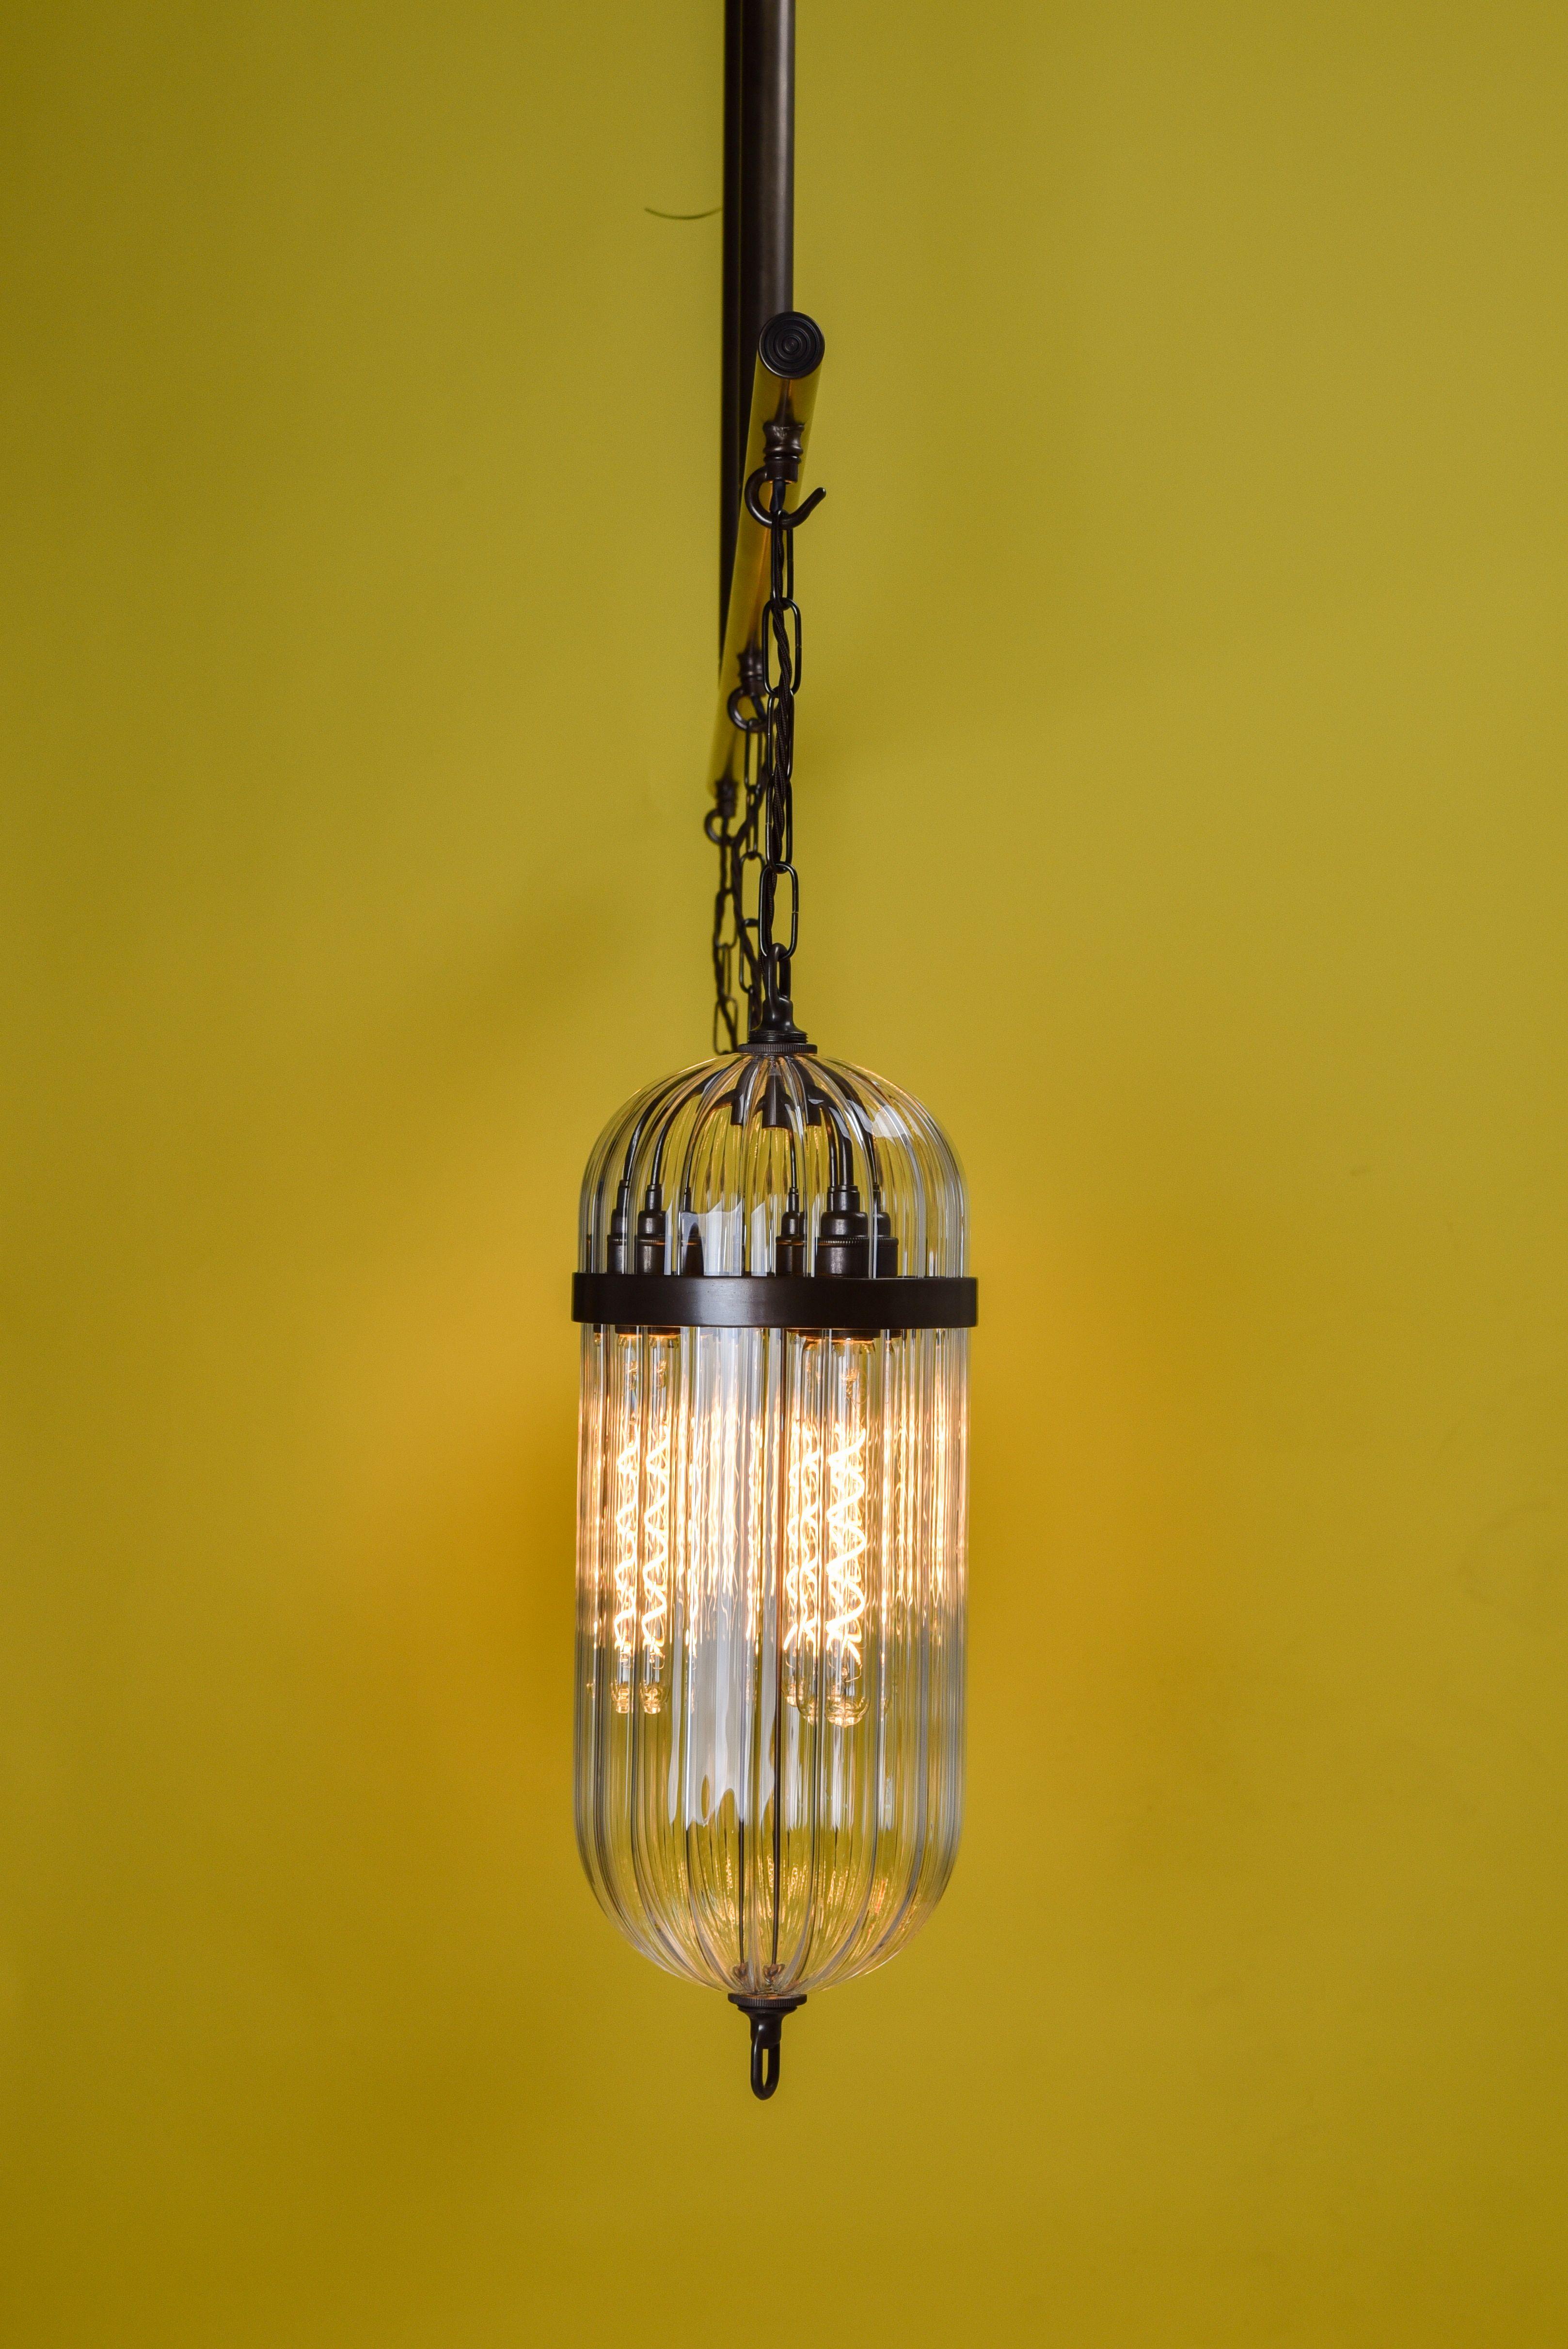 Pin On Bespoke Lighting Design Lighting Specialists Sloping